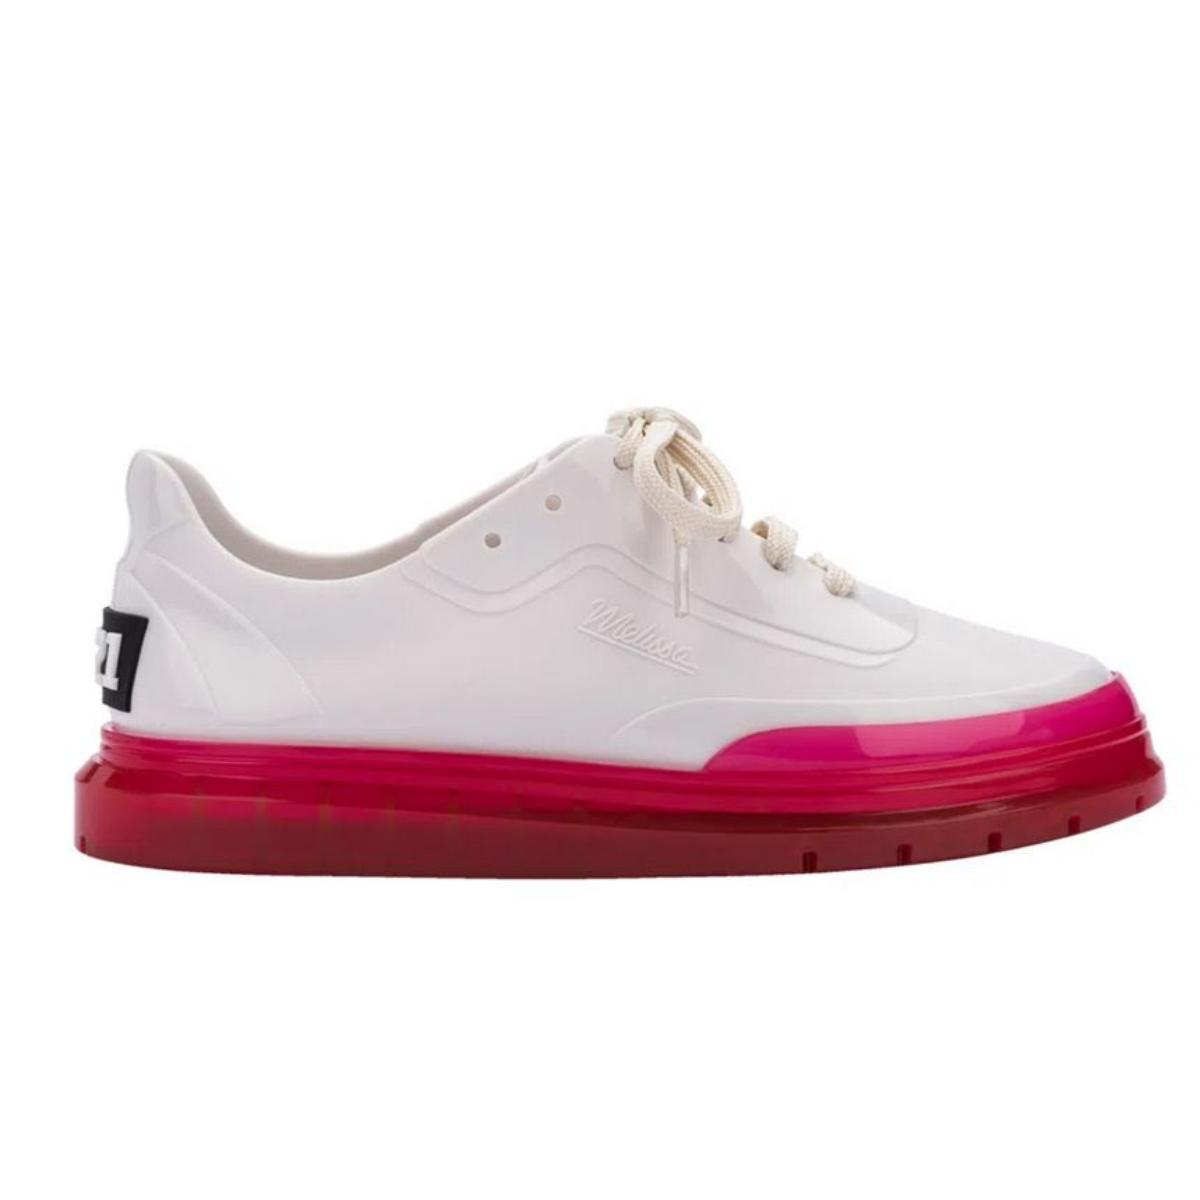 Tênis Feminino Melissa 33399 51463 Classic Sneaker+bt21 Branco/rosa